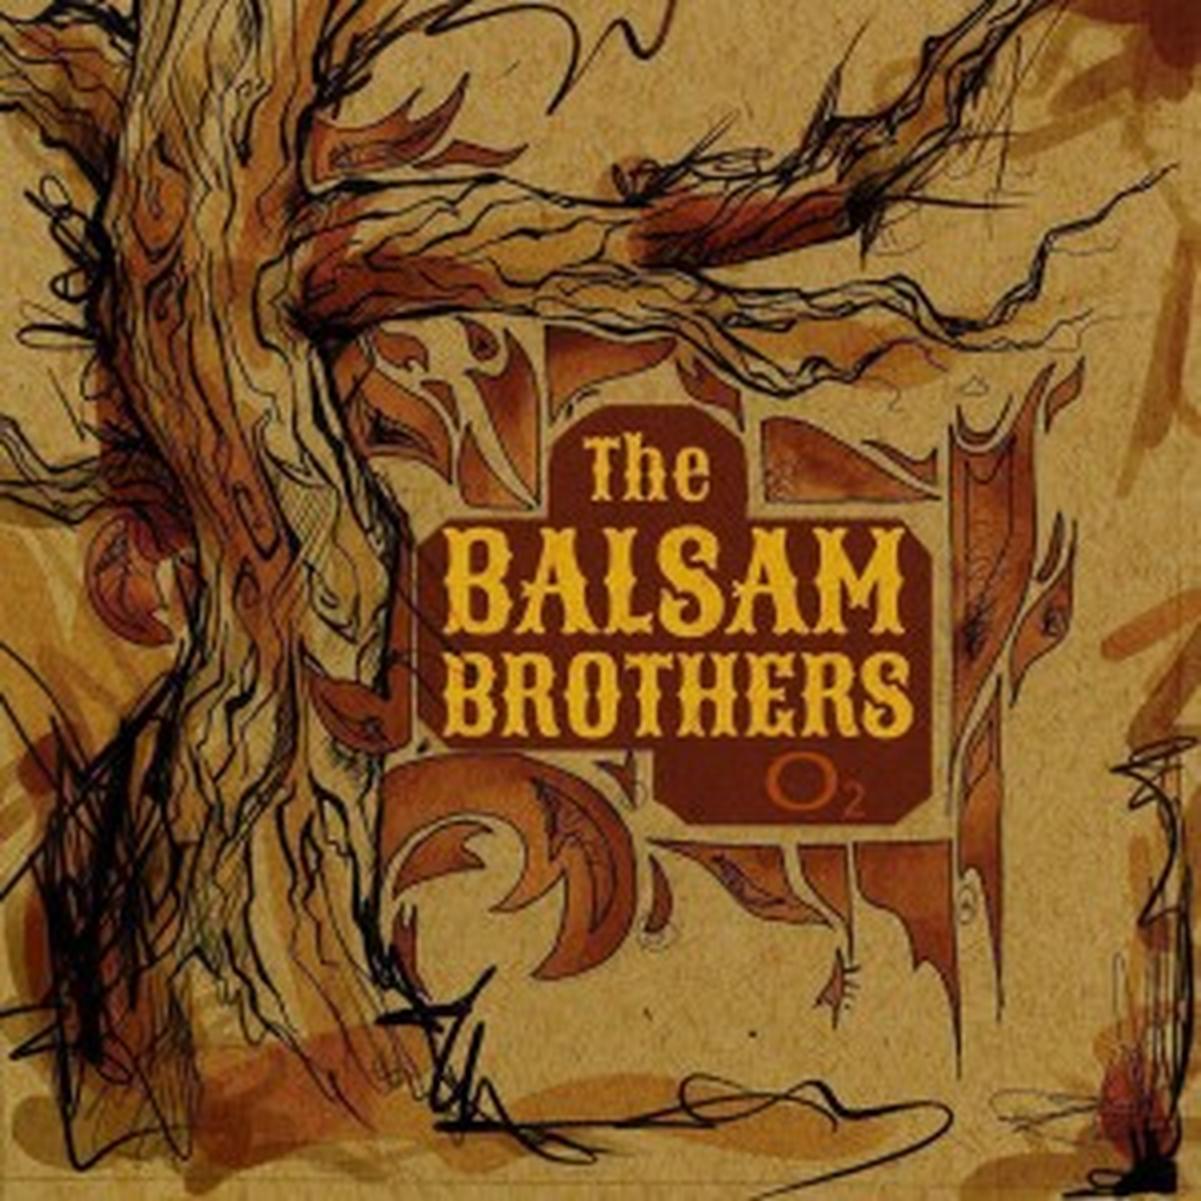 TheBalsamBrothers